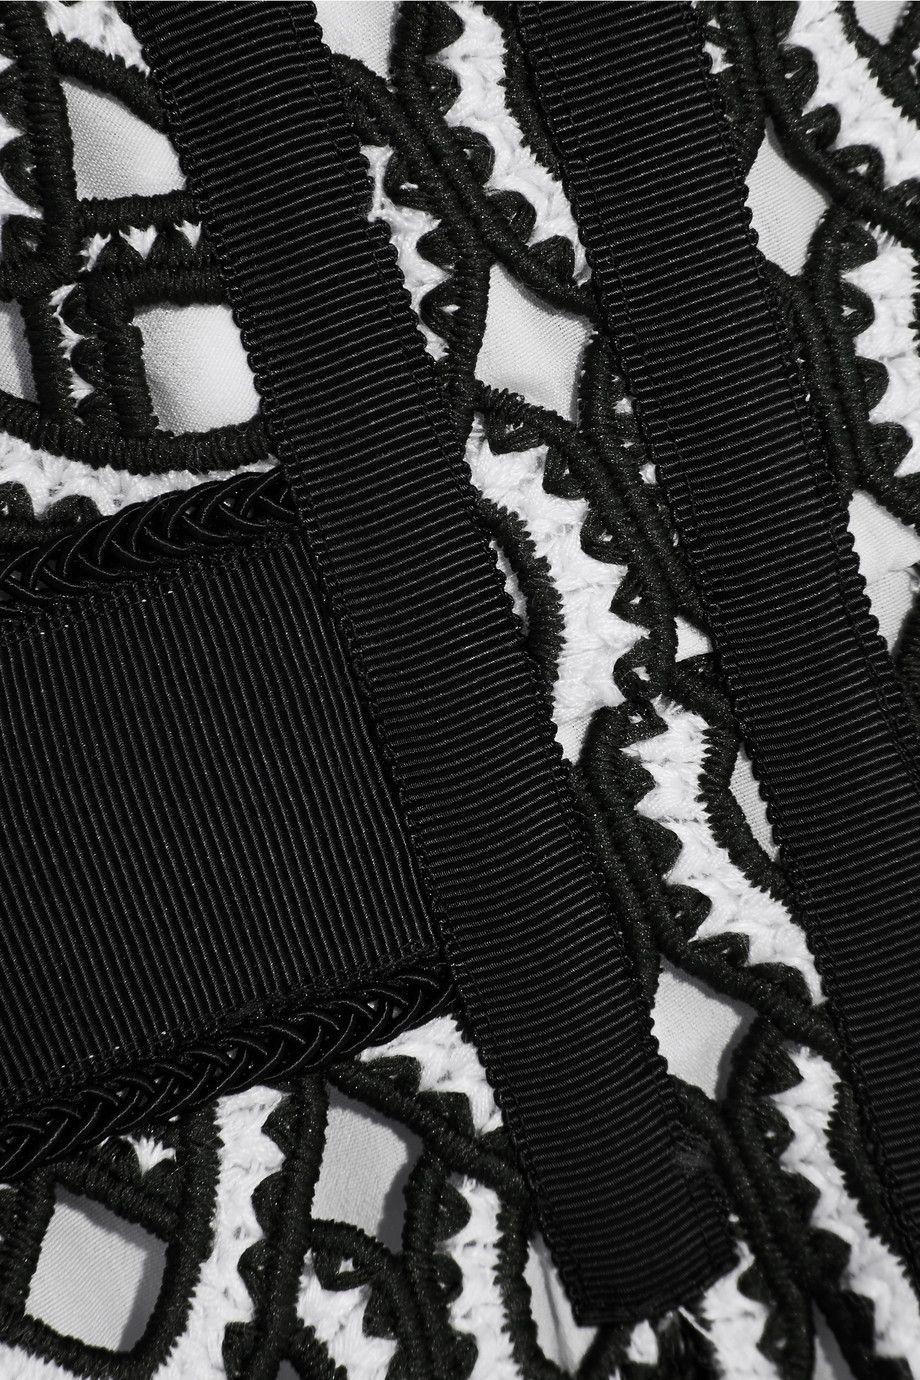 Grosgrain-trimmed Crocheted Lace Midi Dress - Navy Self Portrait Cheap Sale Visit New kZruXV